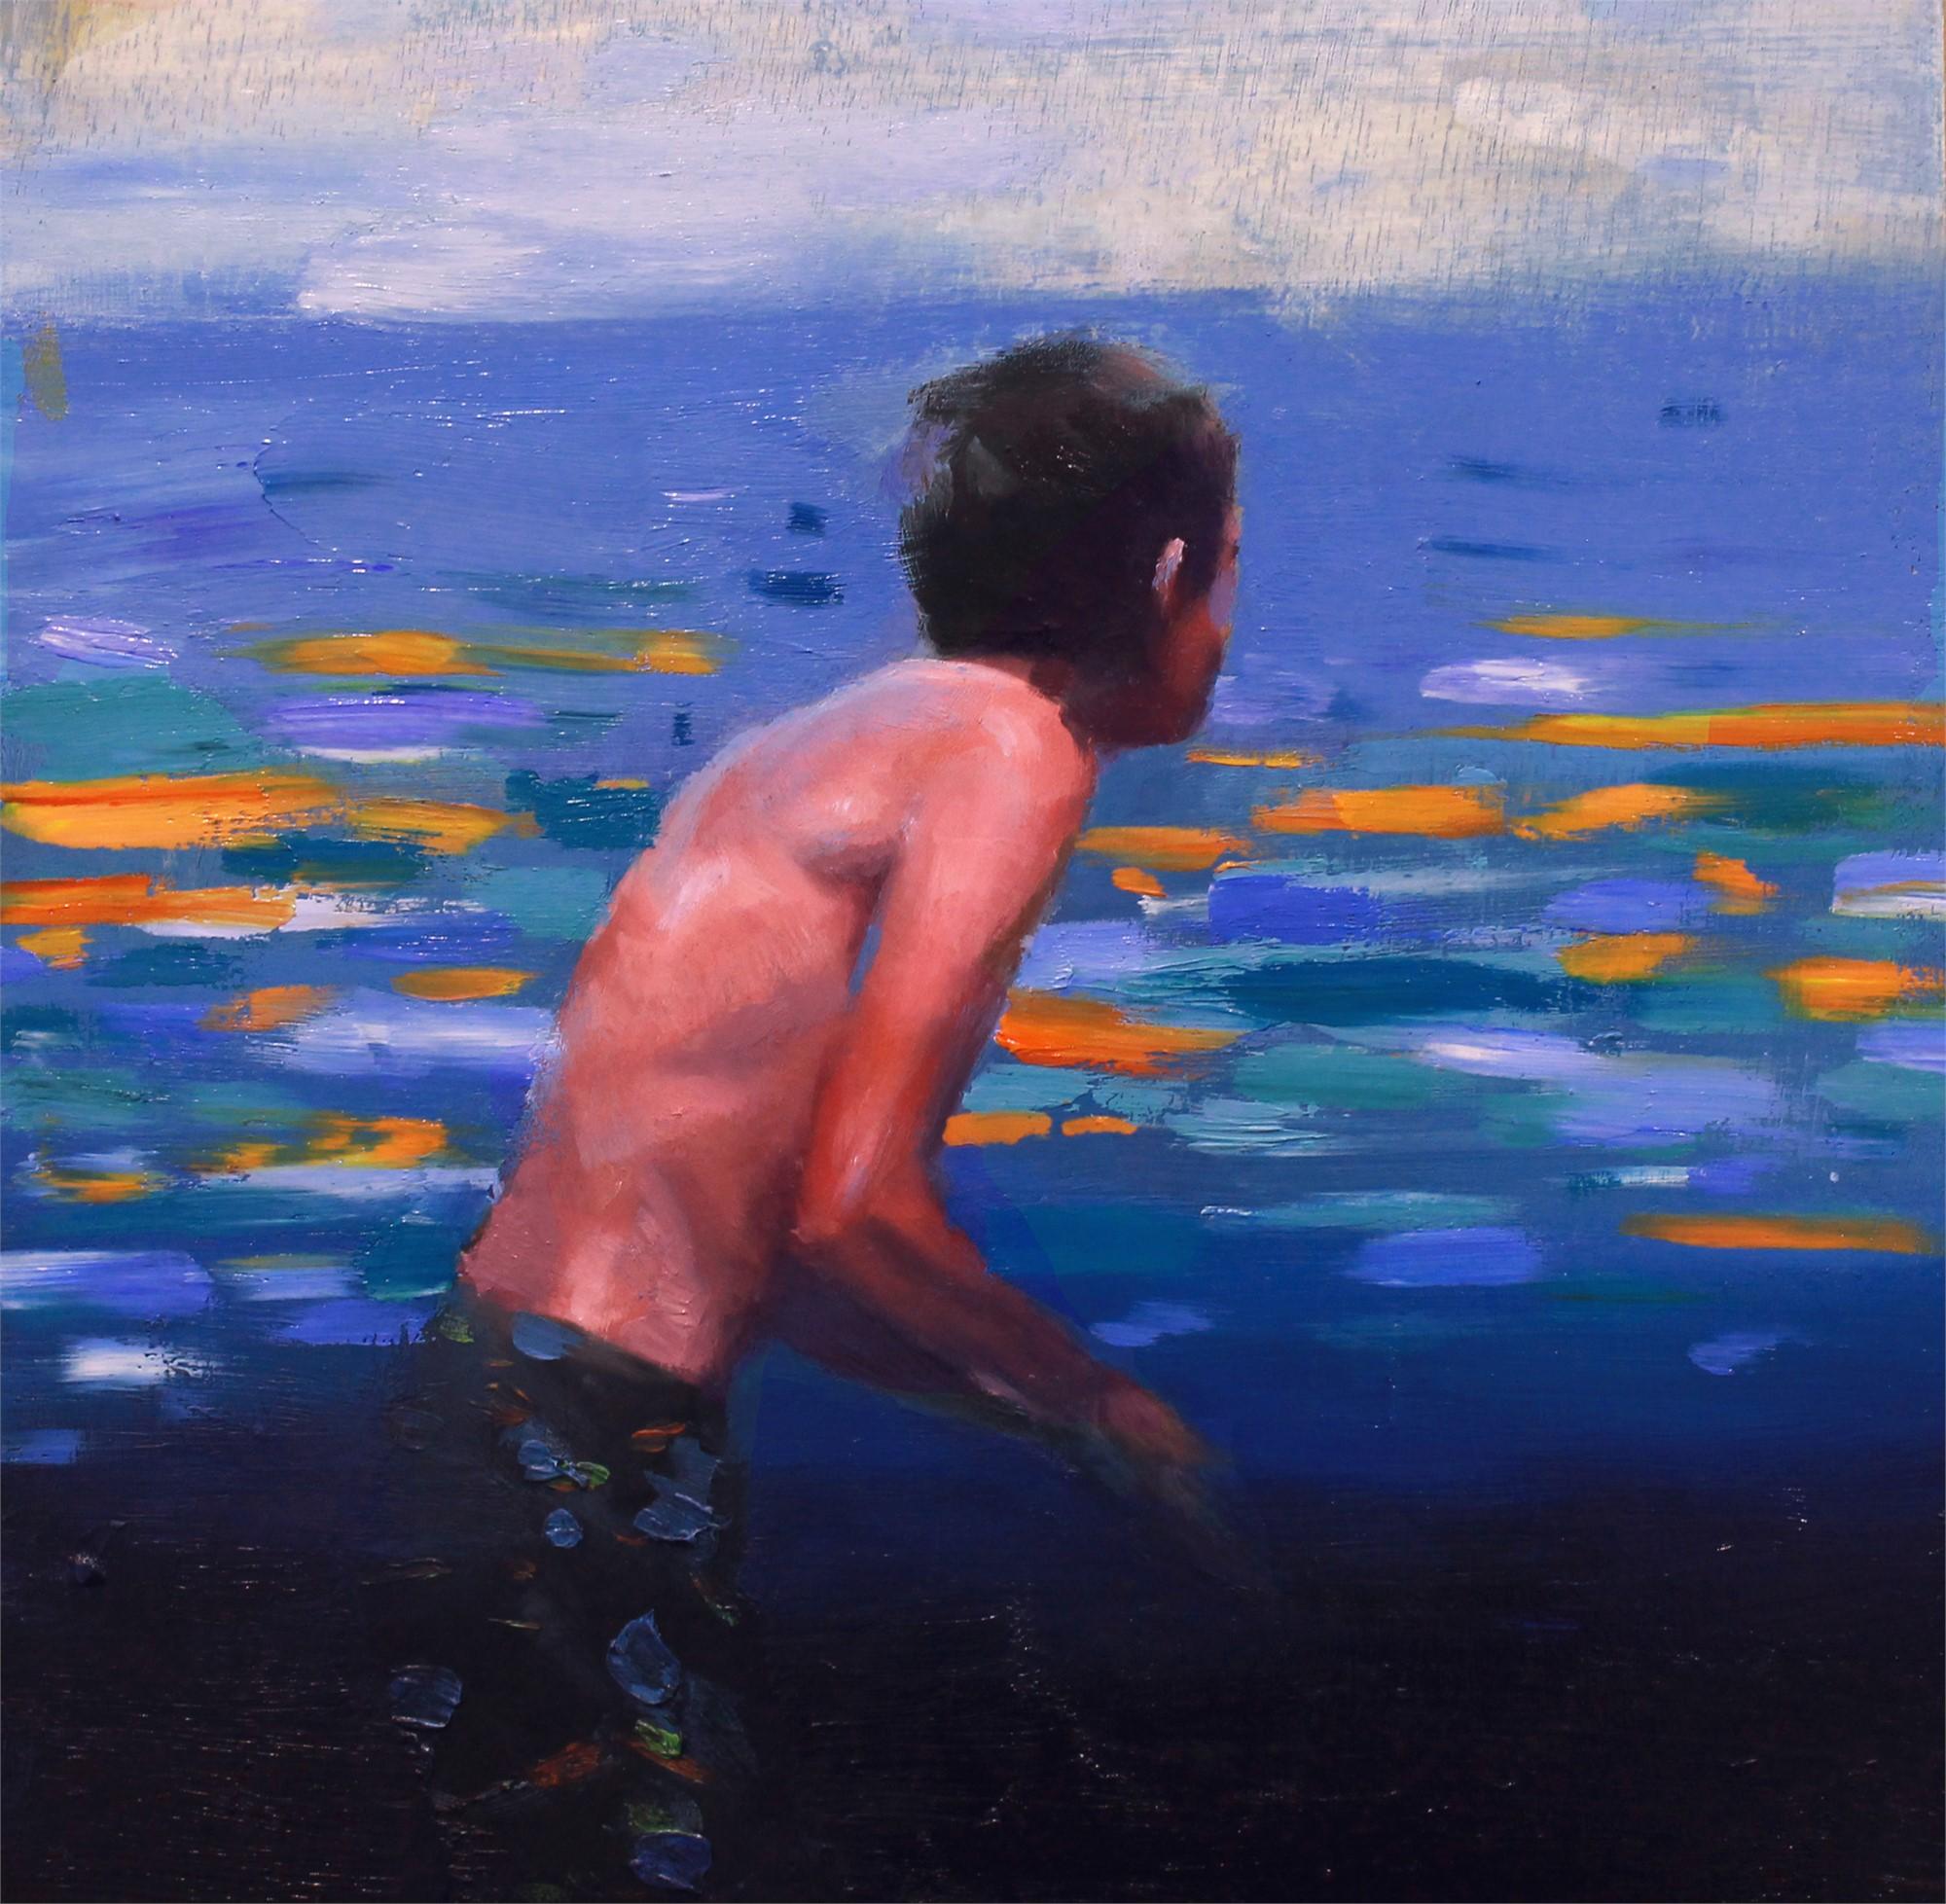 The Jump by Susana Ragel